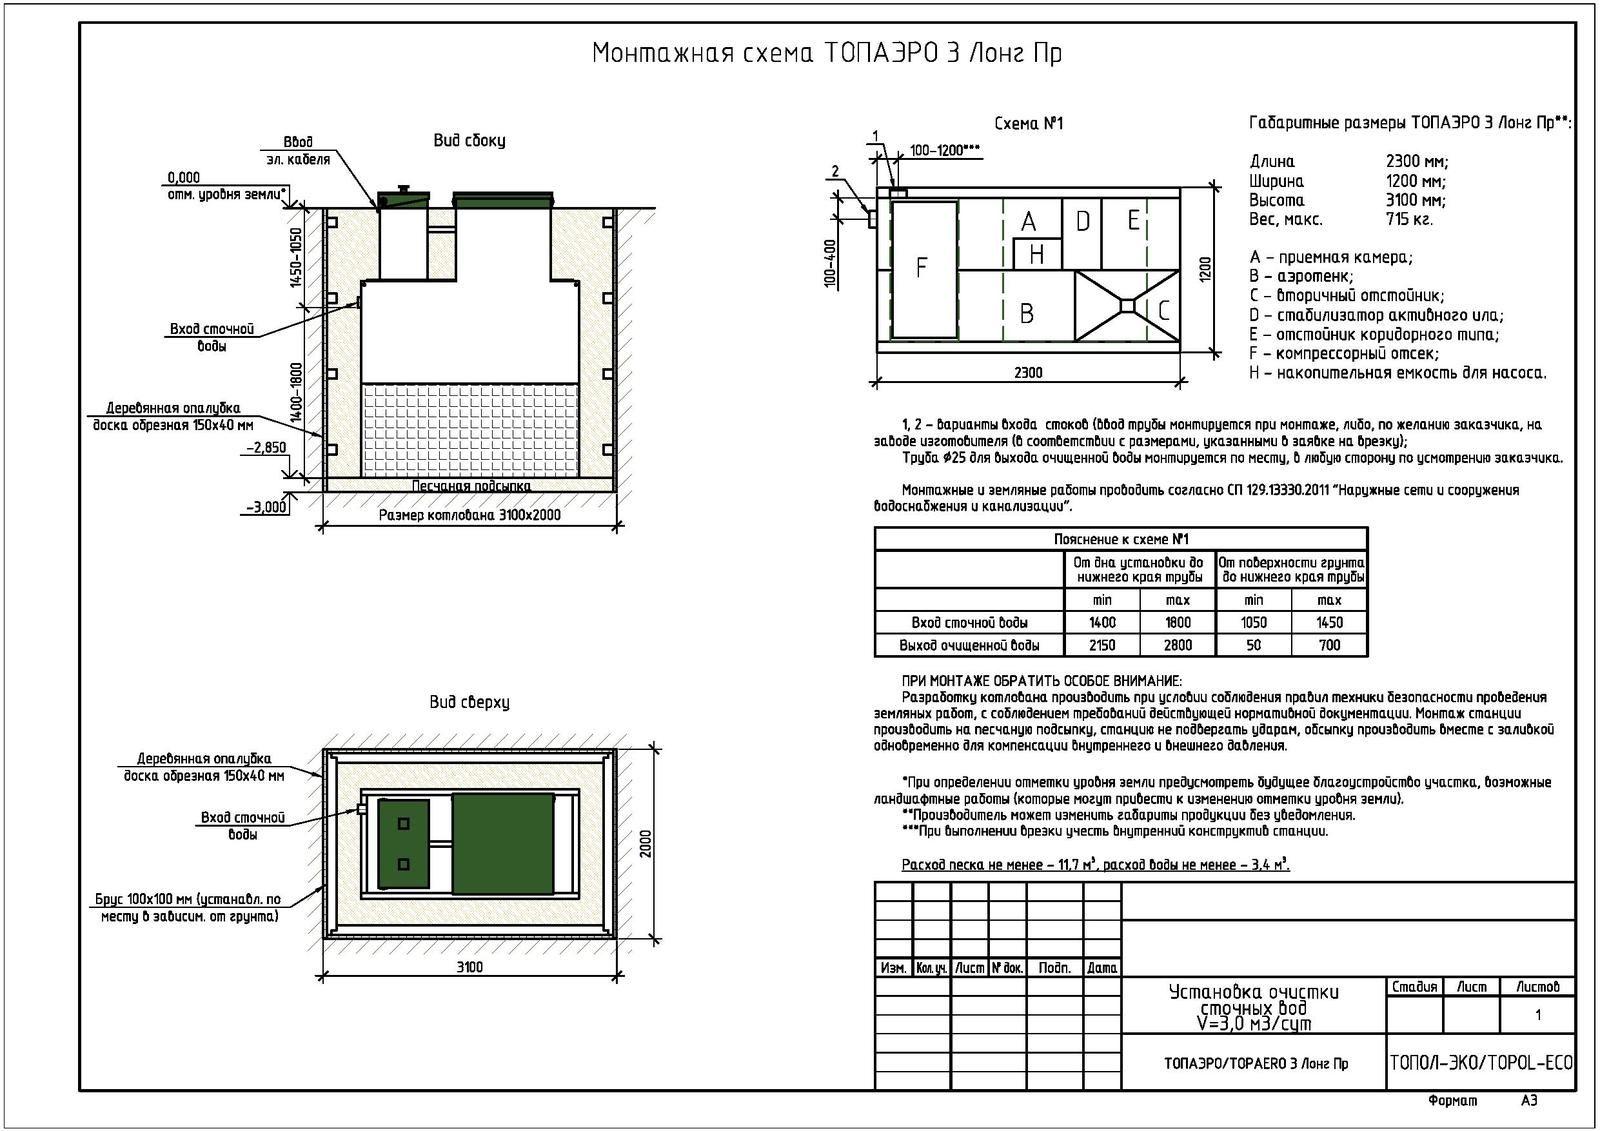 Монтажная схема септика Топаэро 3 Лонг ПР